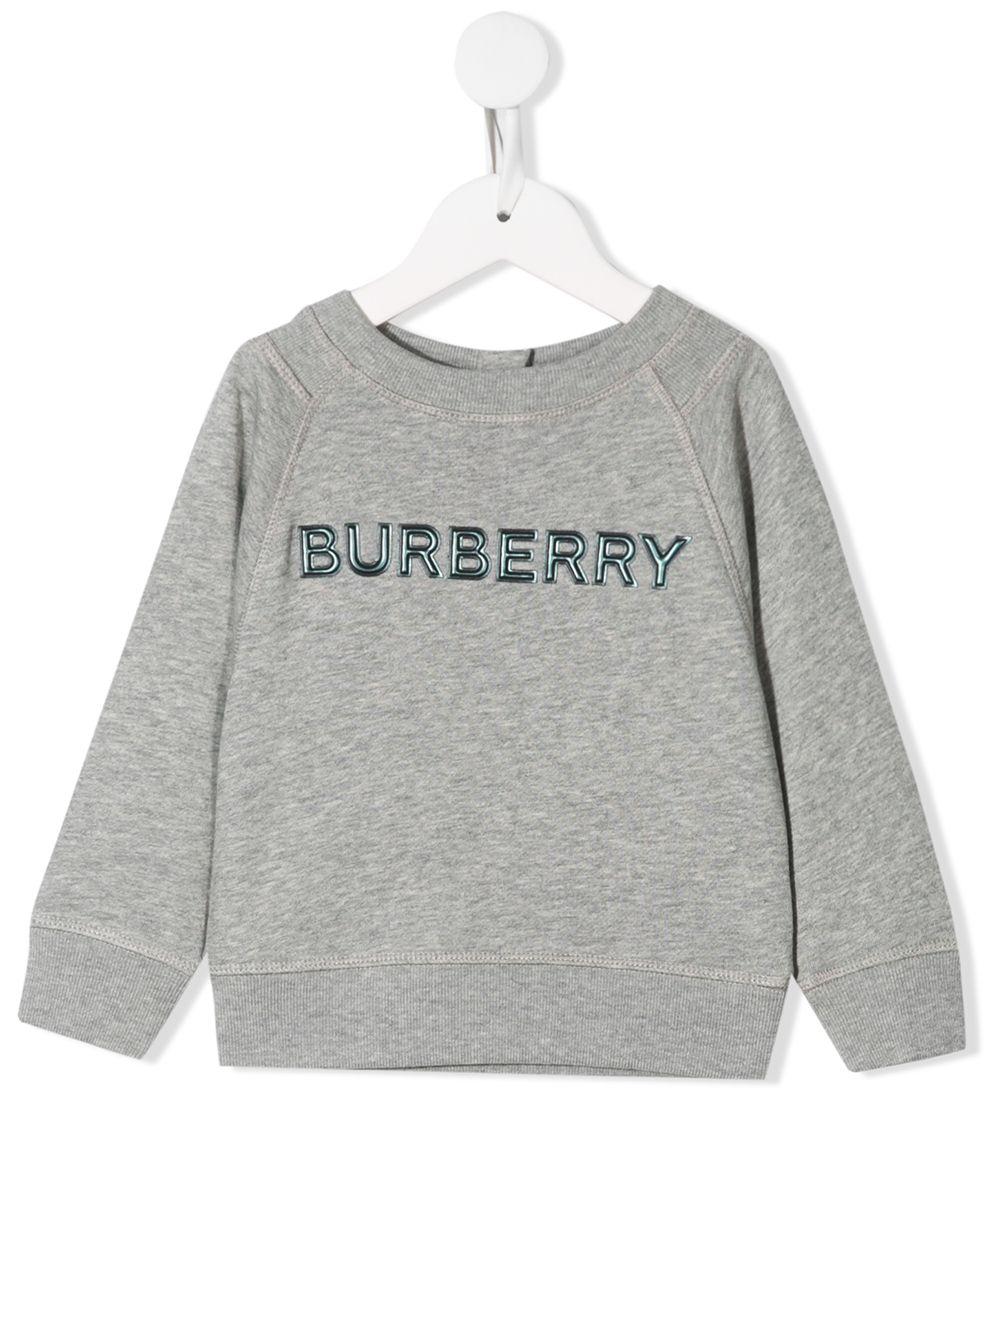 Burberry Kids | толстовка с вышитым логотипом | Clouty